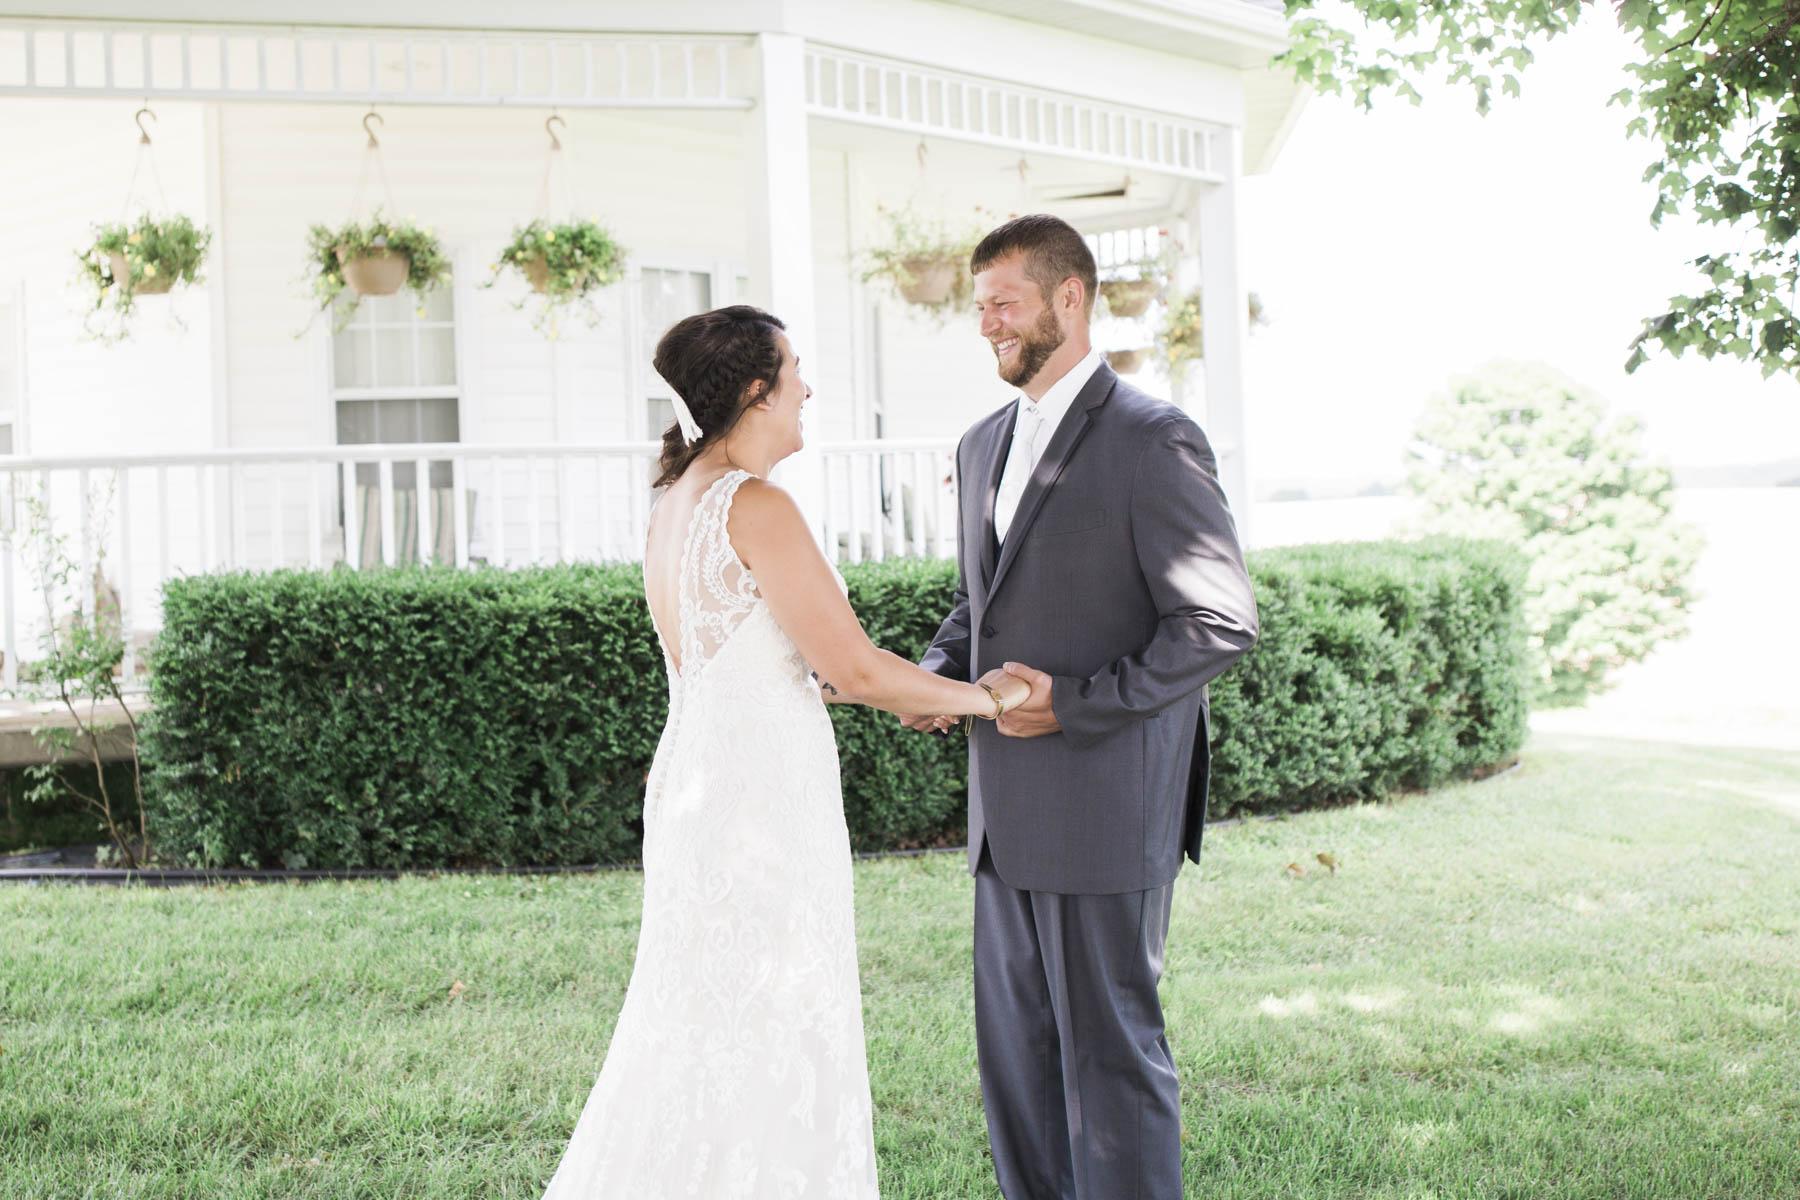 shotbychelsea_wedding_blog-10.jpg